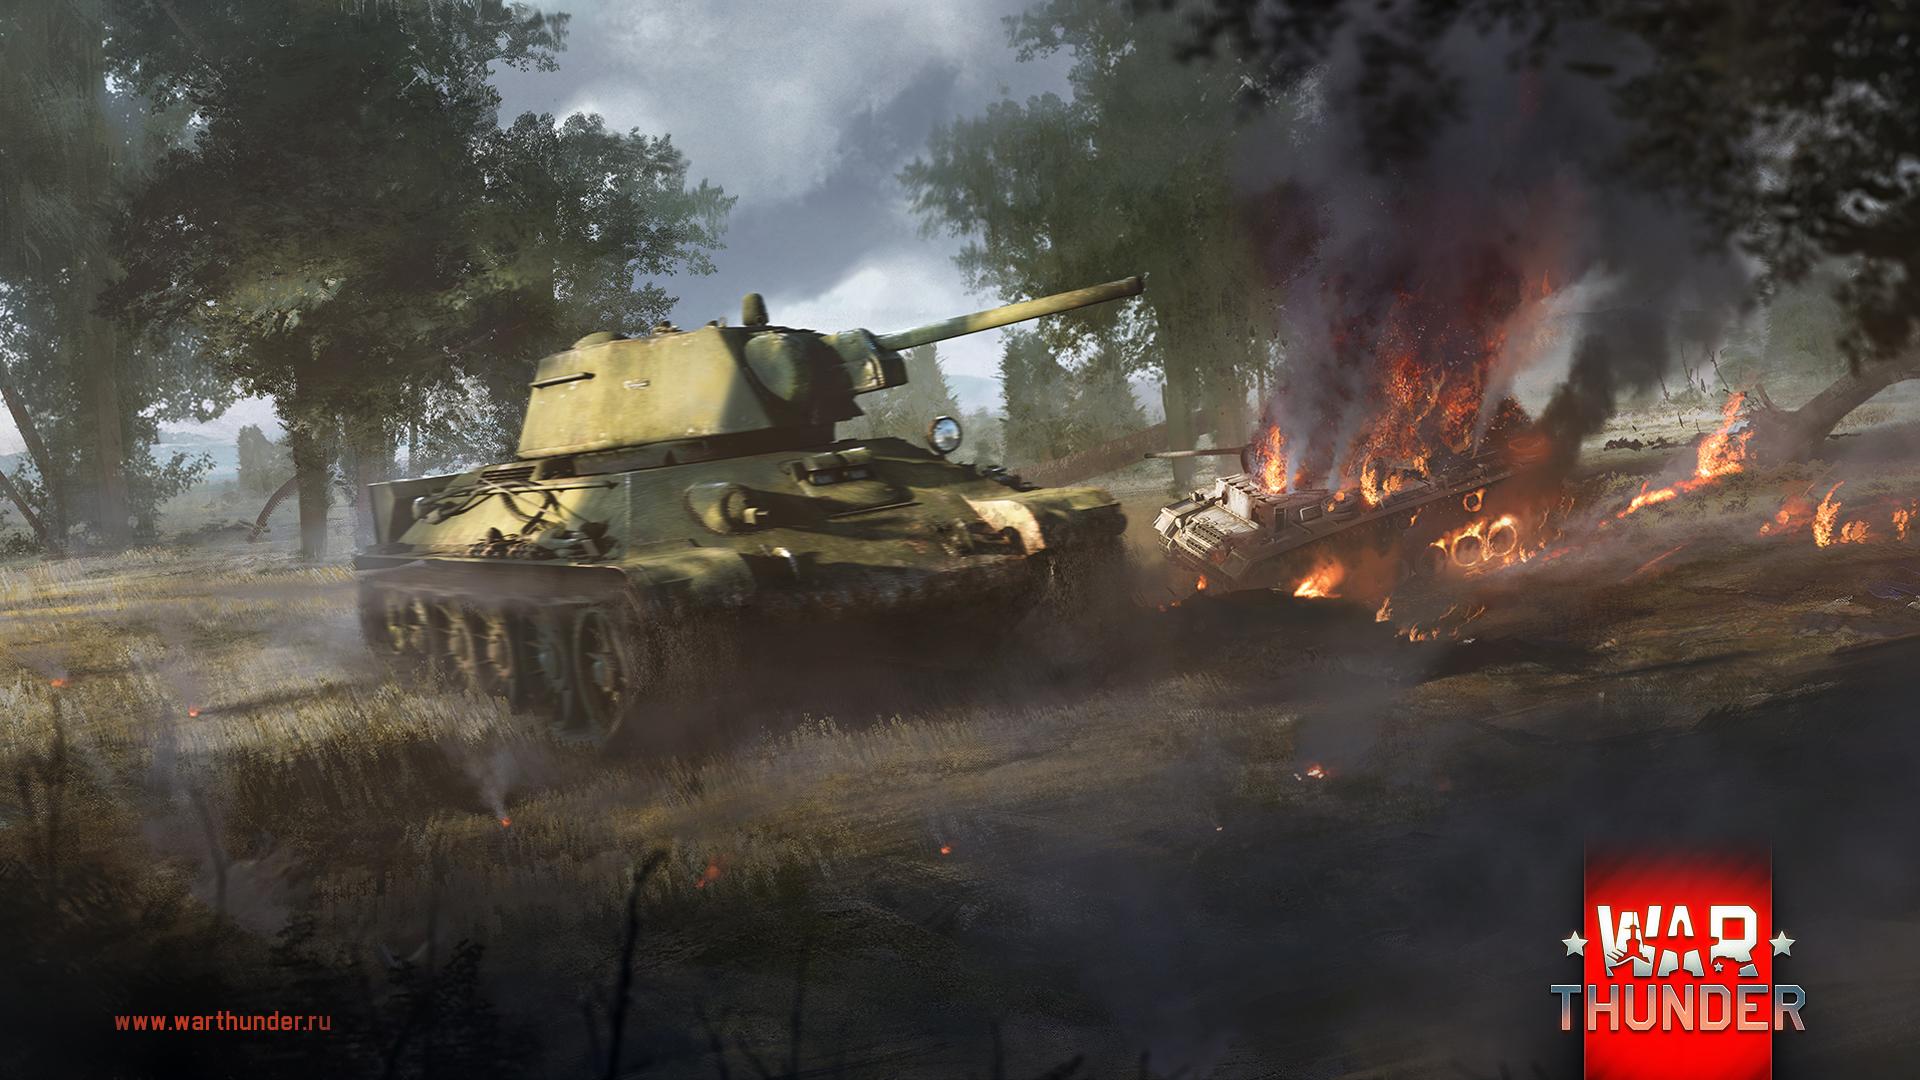 рисунок Т-34-76 vs Pz.Kpfw IIIL